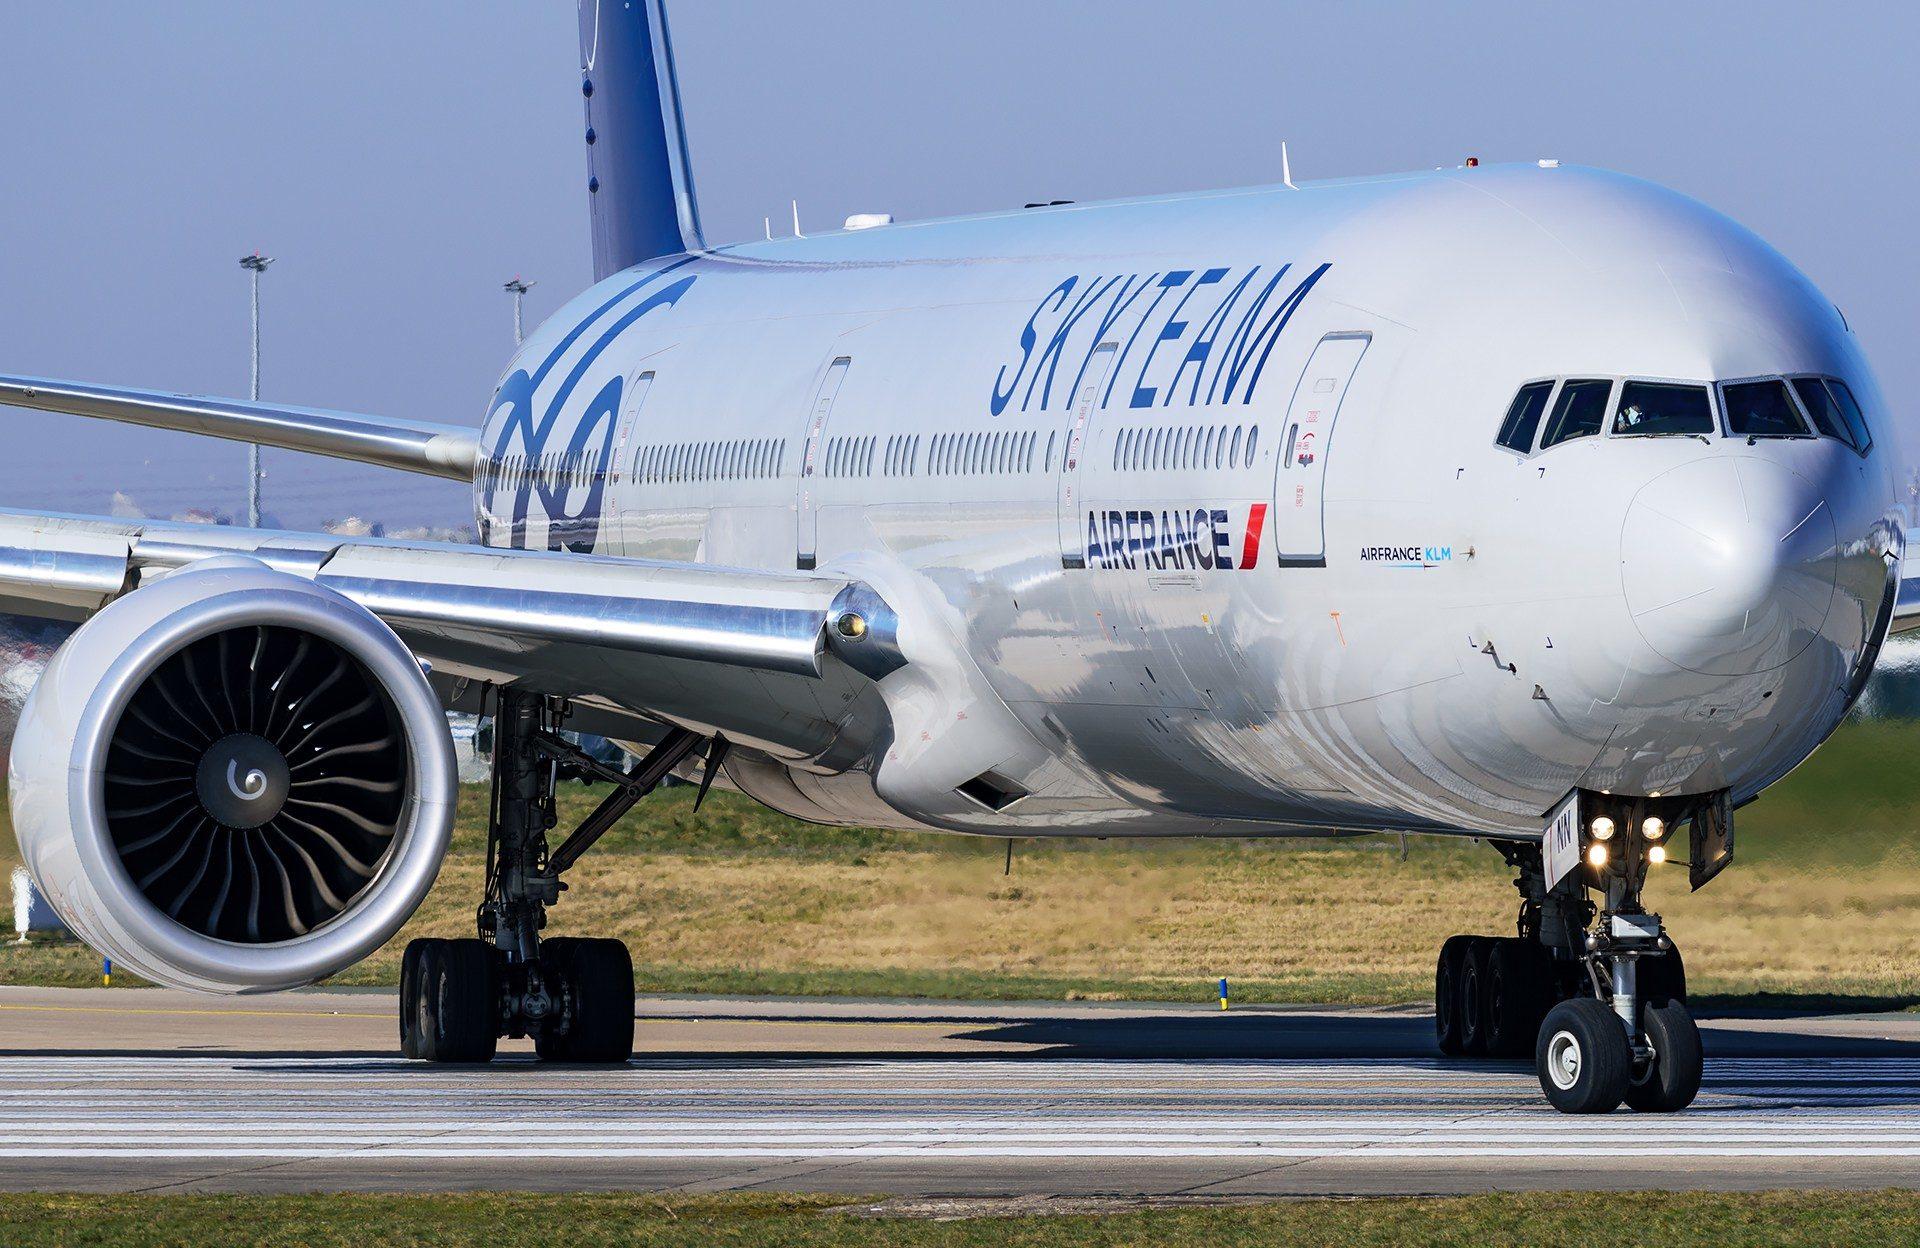 Boeing 777-200 Air France livrée Skyteam